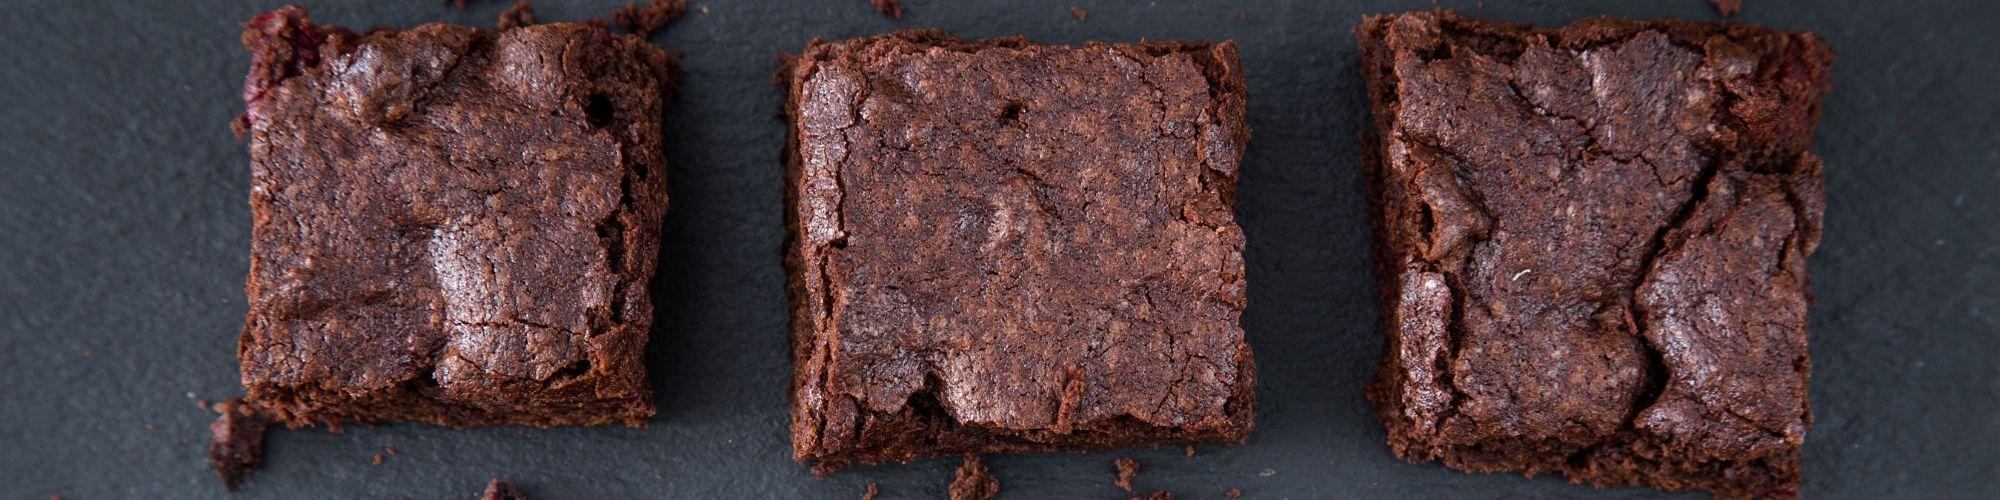 is chocolate vegan